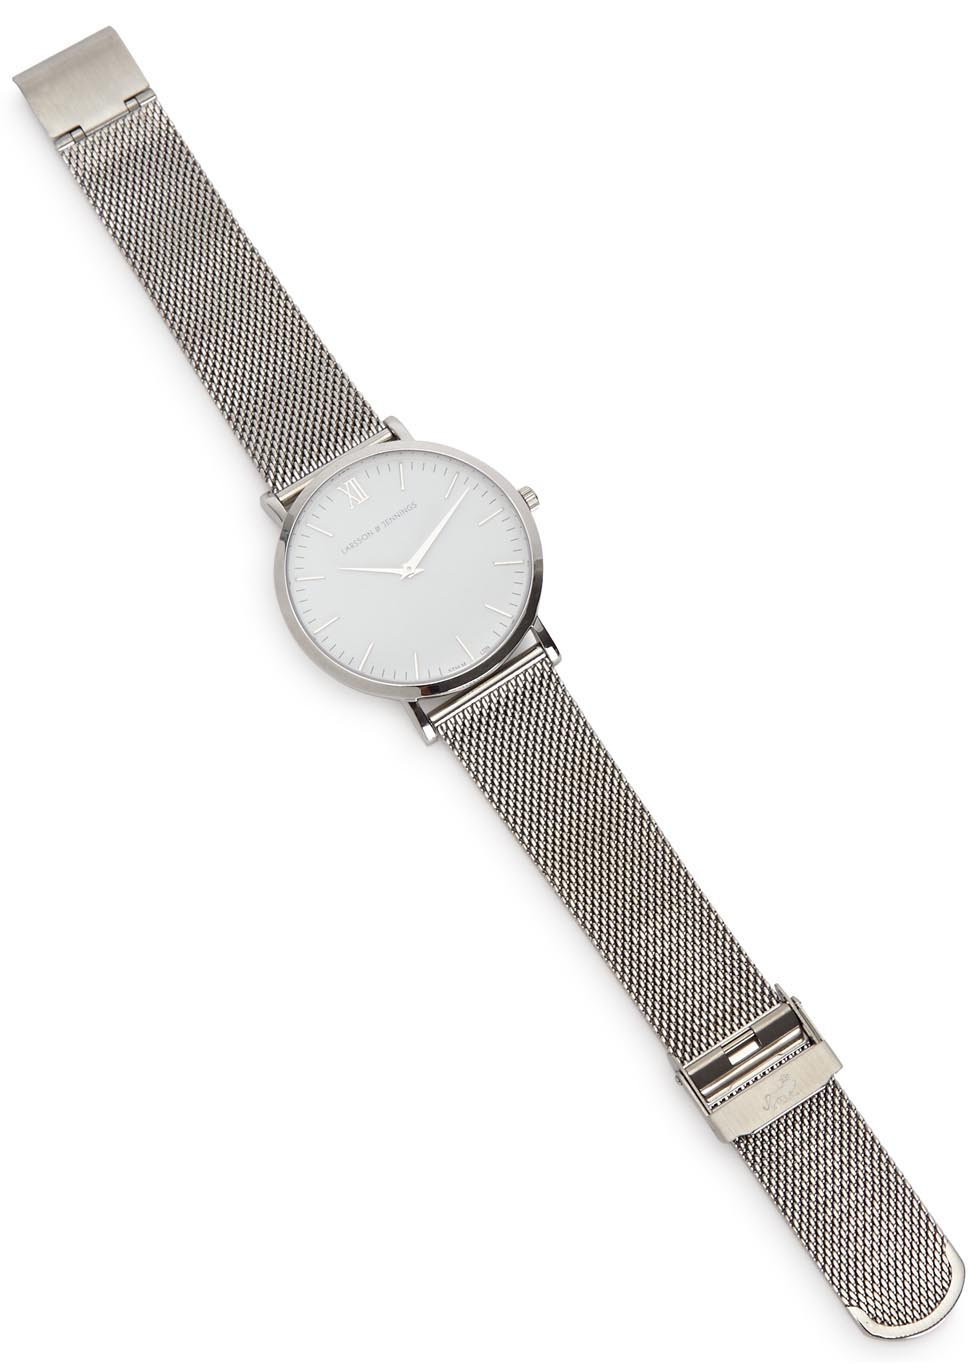 Chain Metal stainless steel watch - Larsson & Jennings